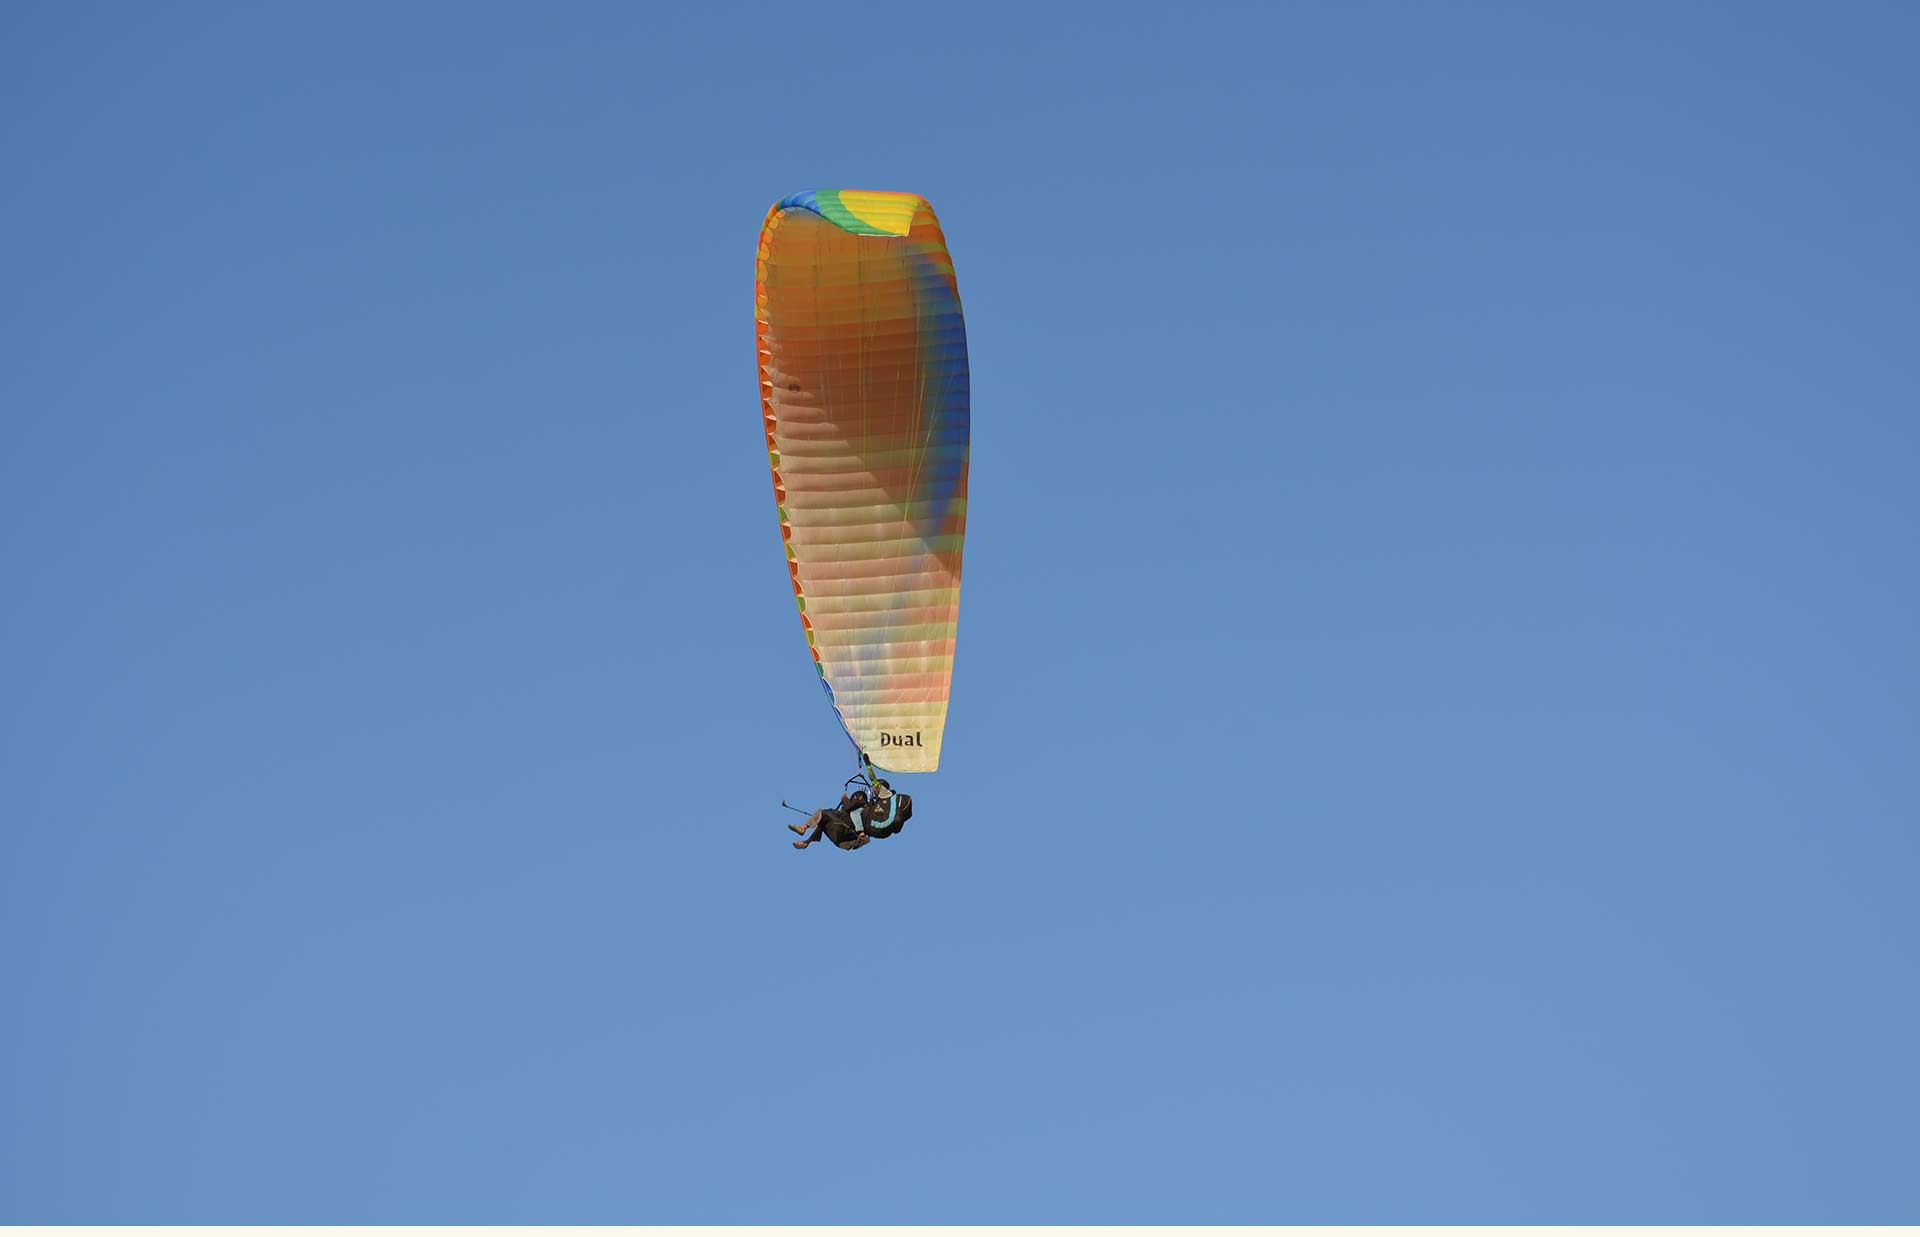 Himalayan Budget Paragliding Trekking Adventure Manali Himachal Pradesh